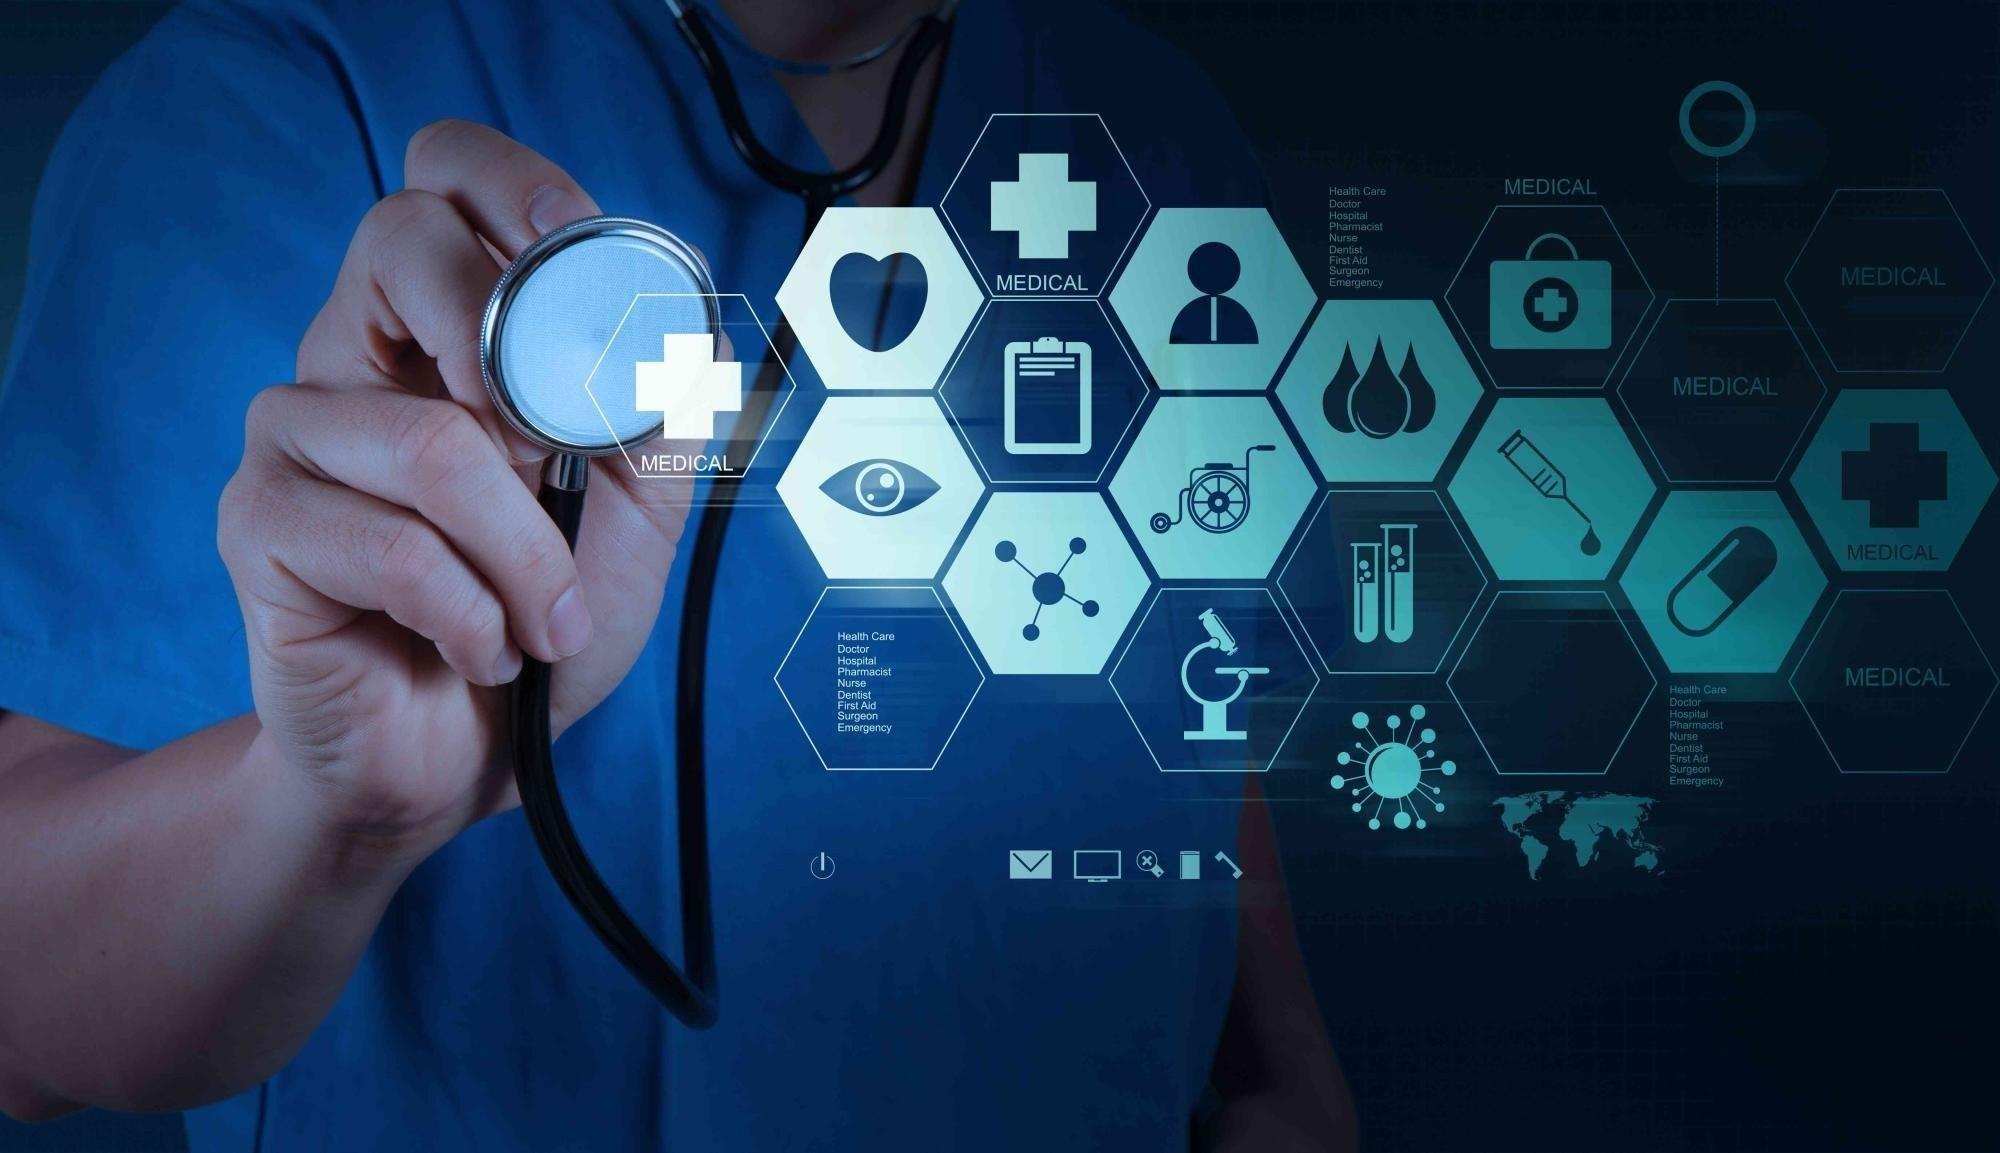 Res 1920x1200 Internal Medicine 1032708 Hd Wallpaper Backgrounds Download